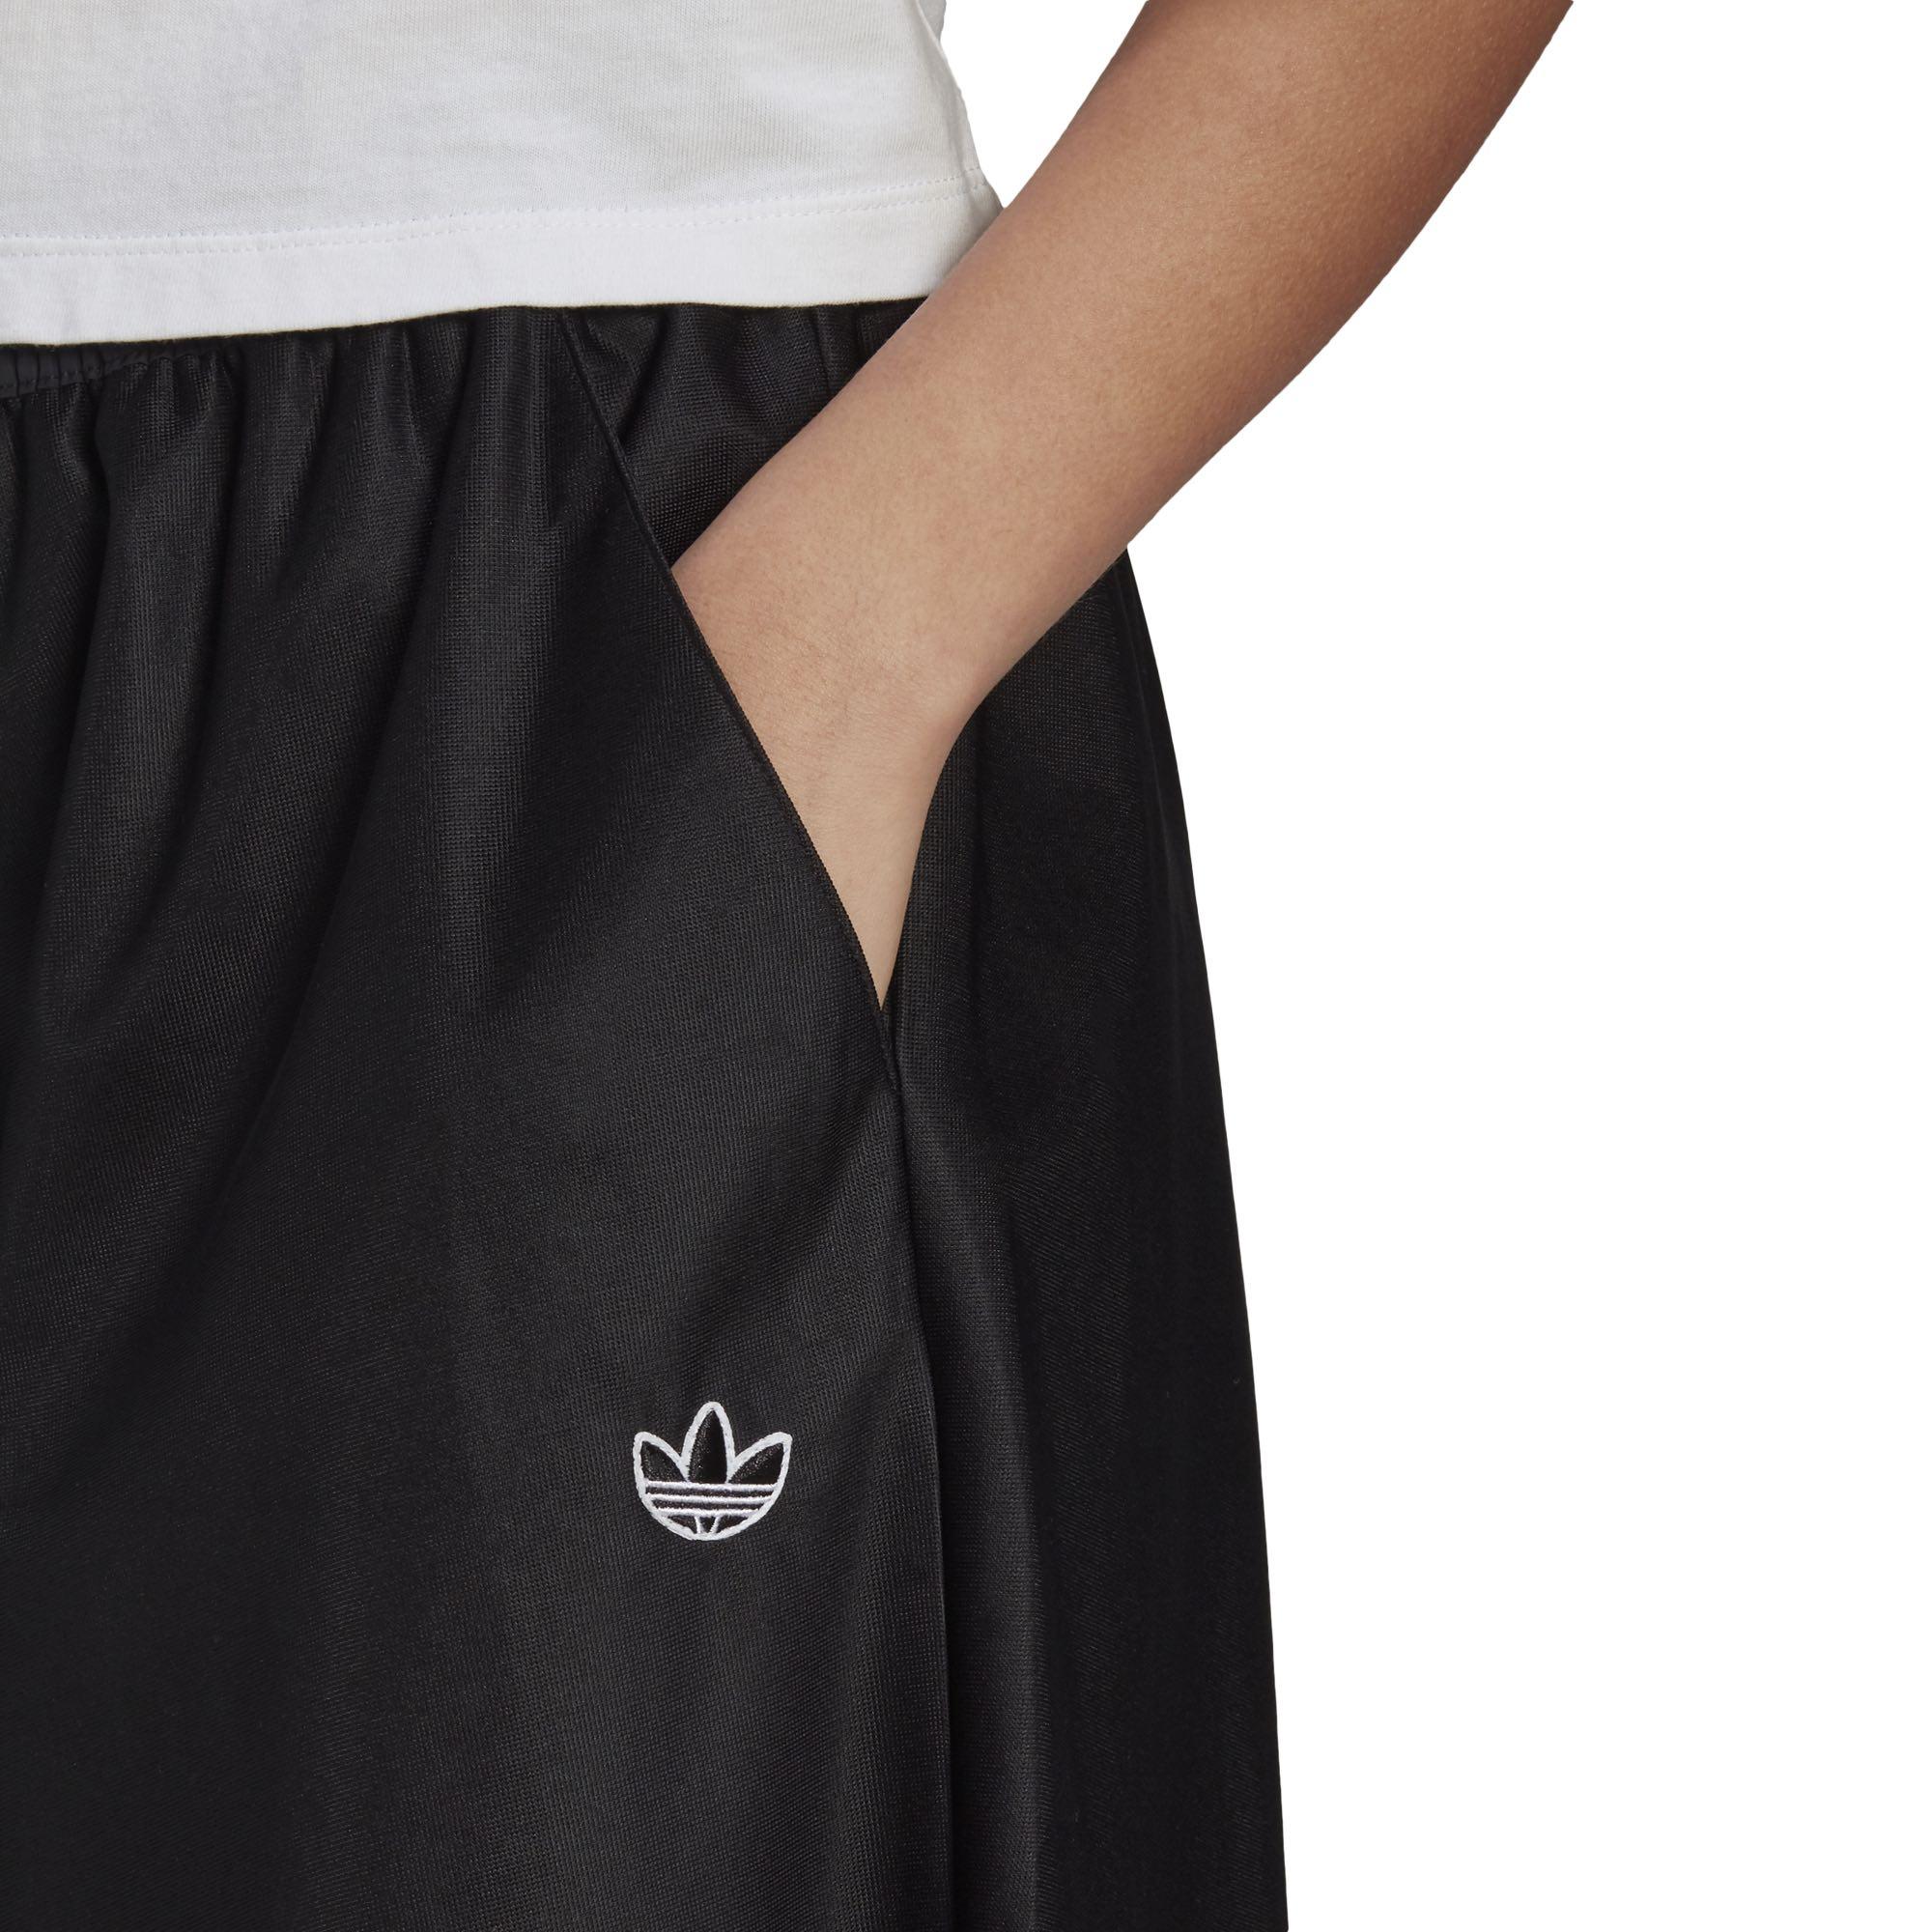 Adidas 3/4 pant black